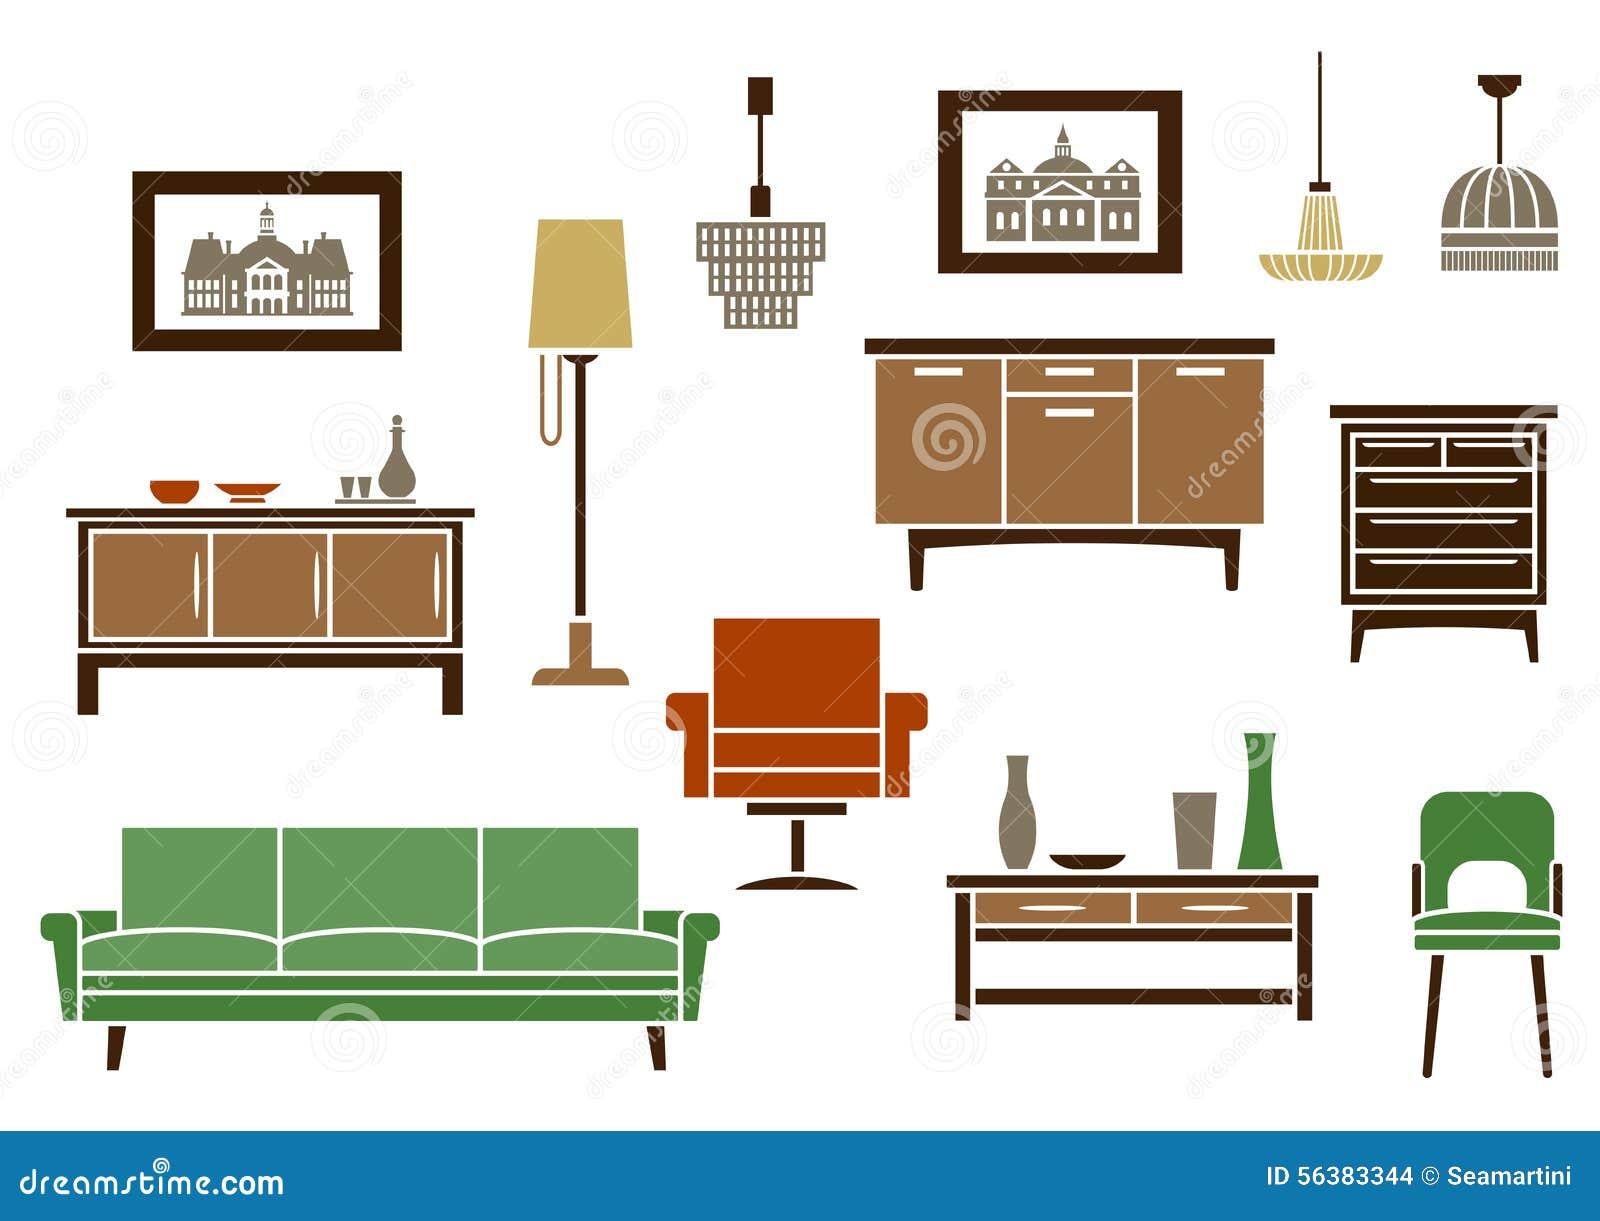 Muebles del hogar e iconos planos interiores ilustraci n for Muebles de hogar